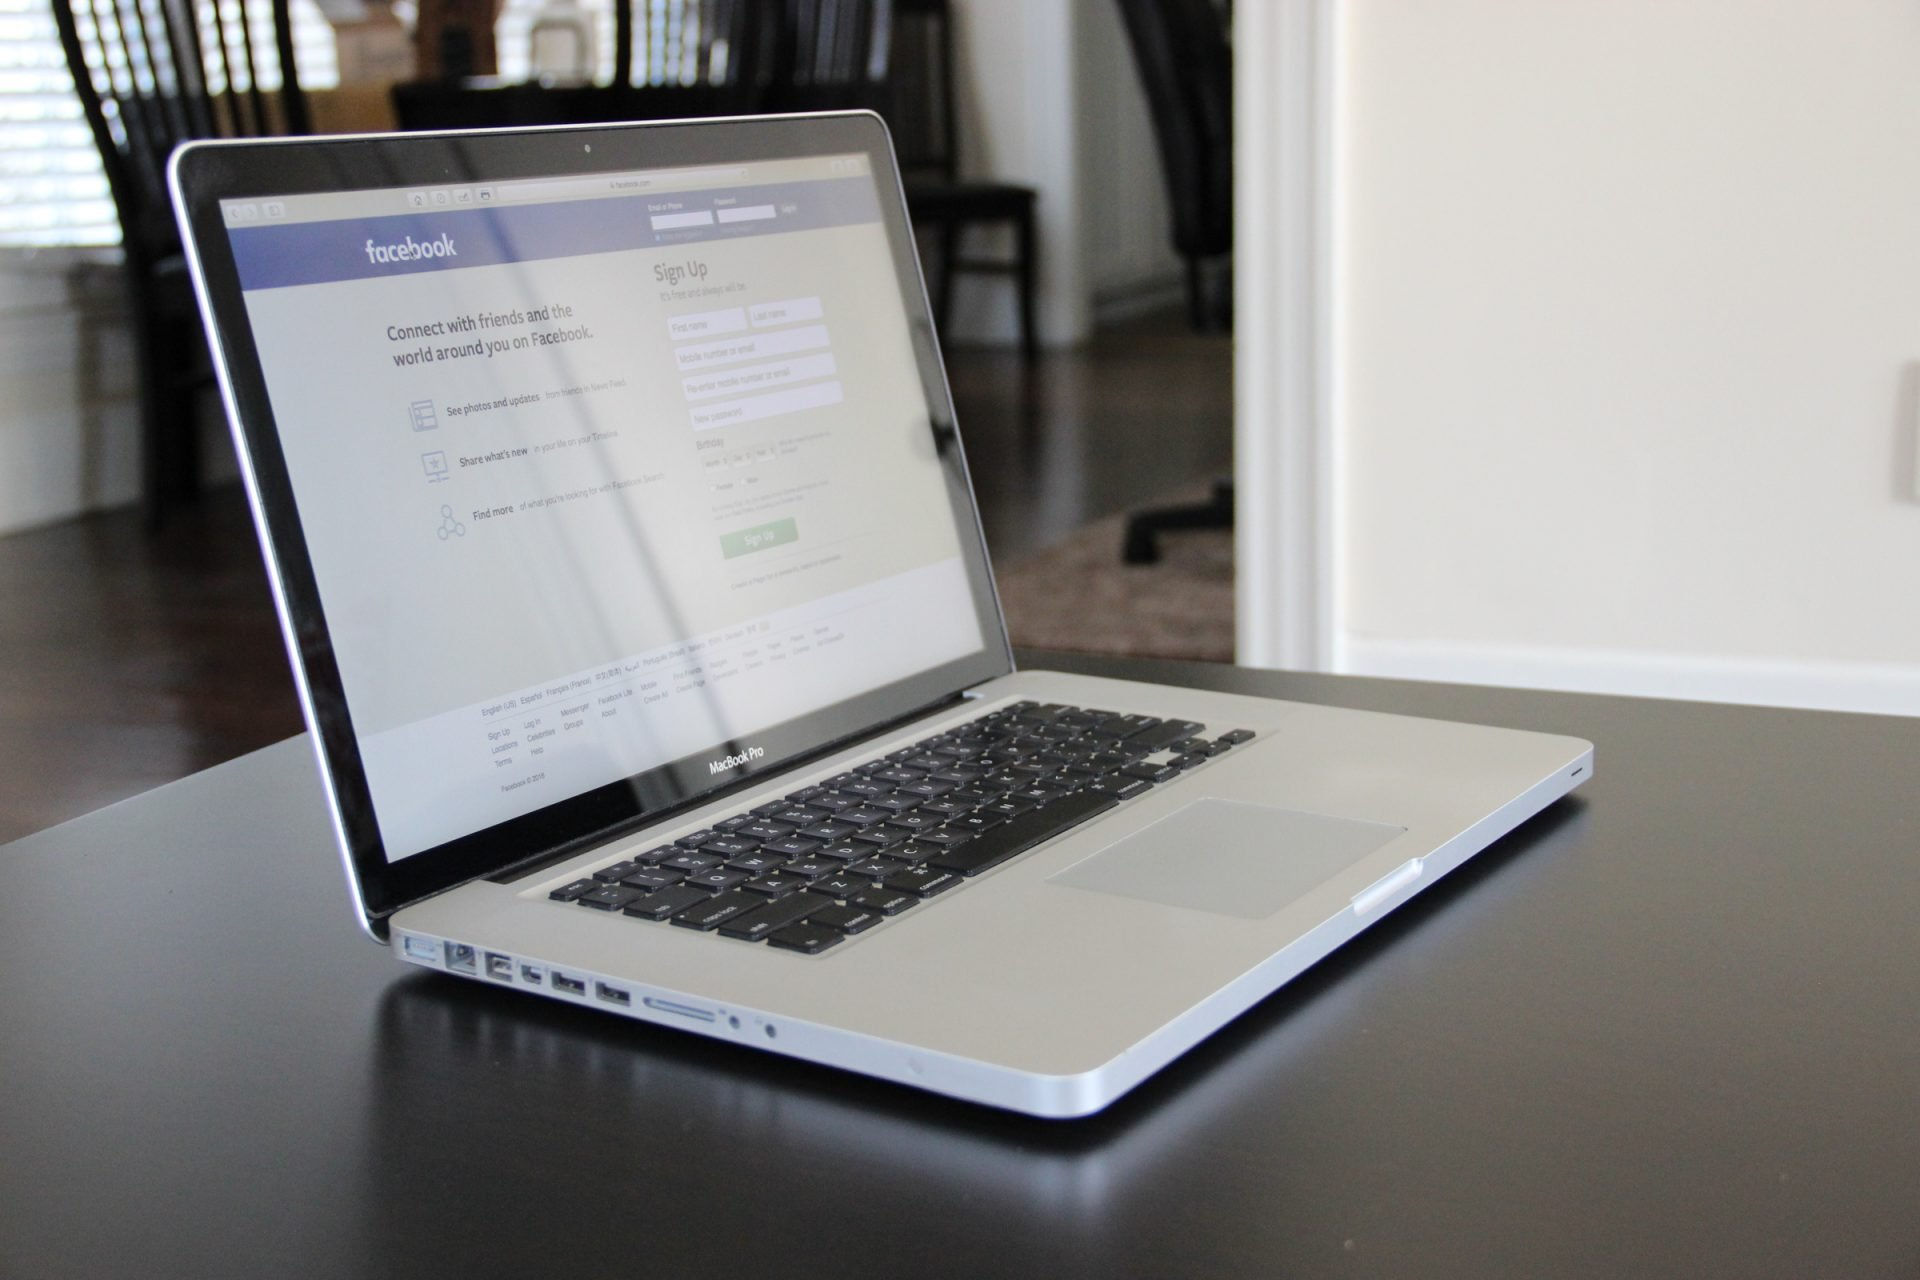 Macbook Laptop Opened to Facebook